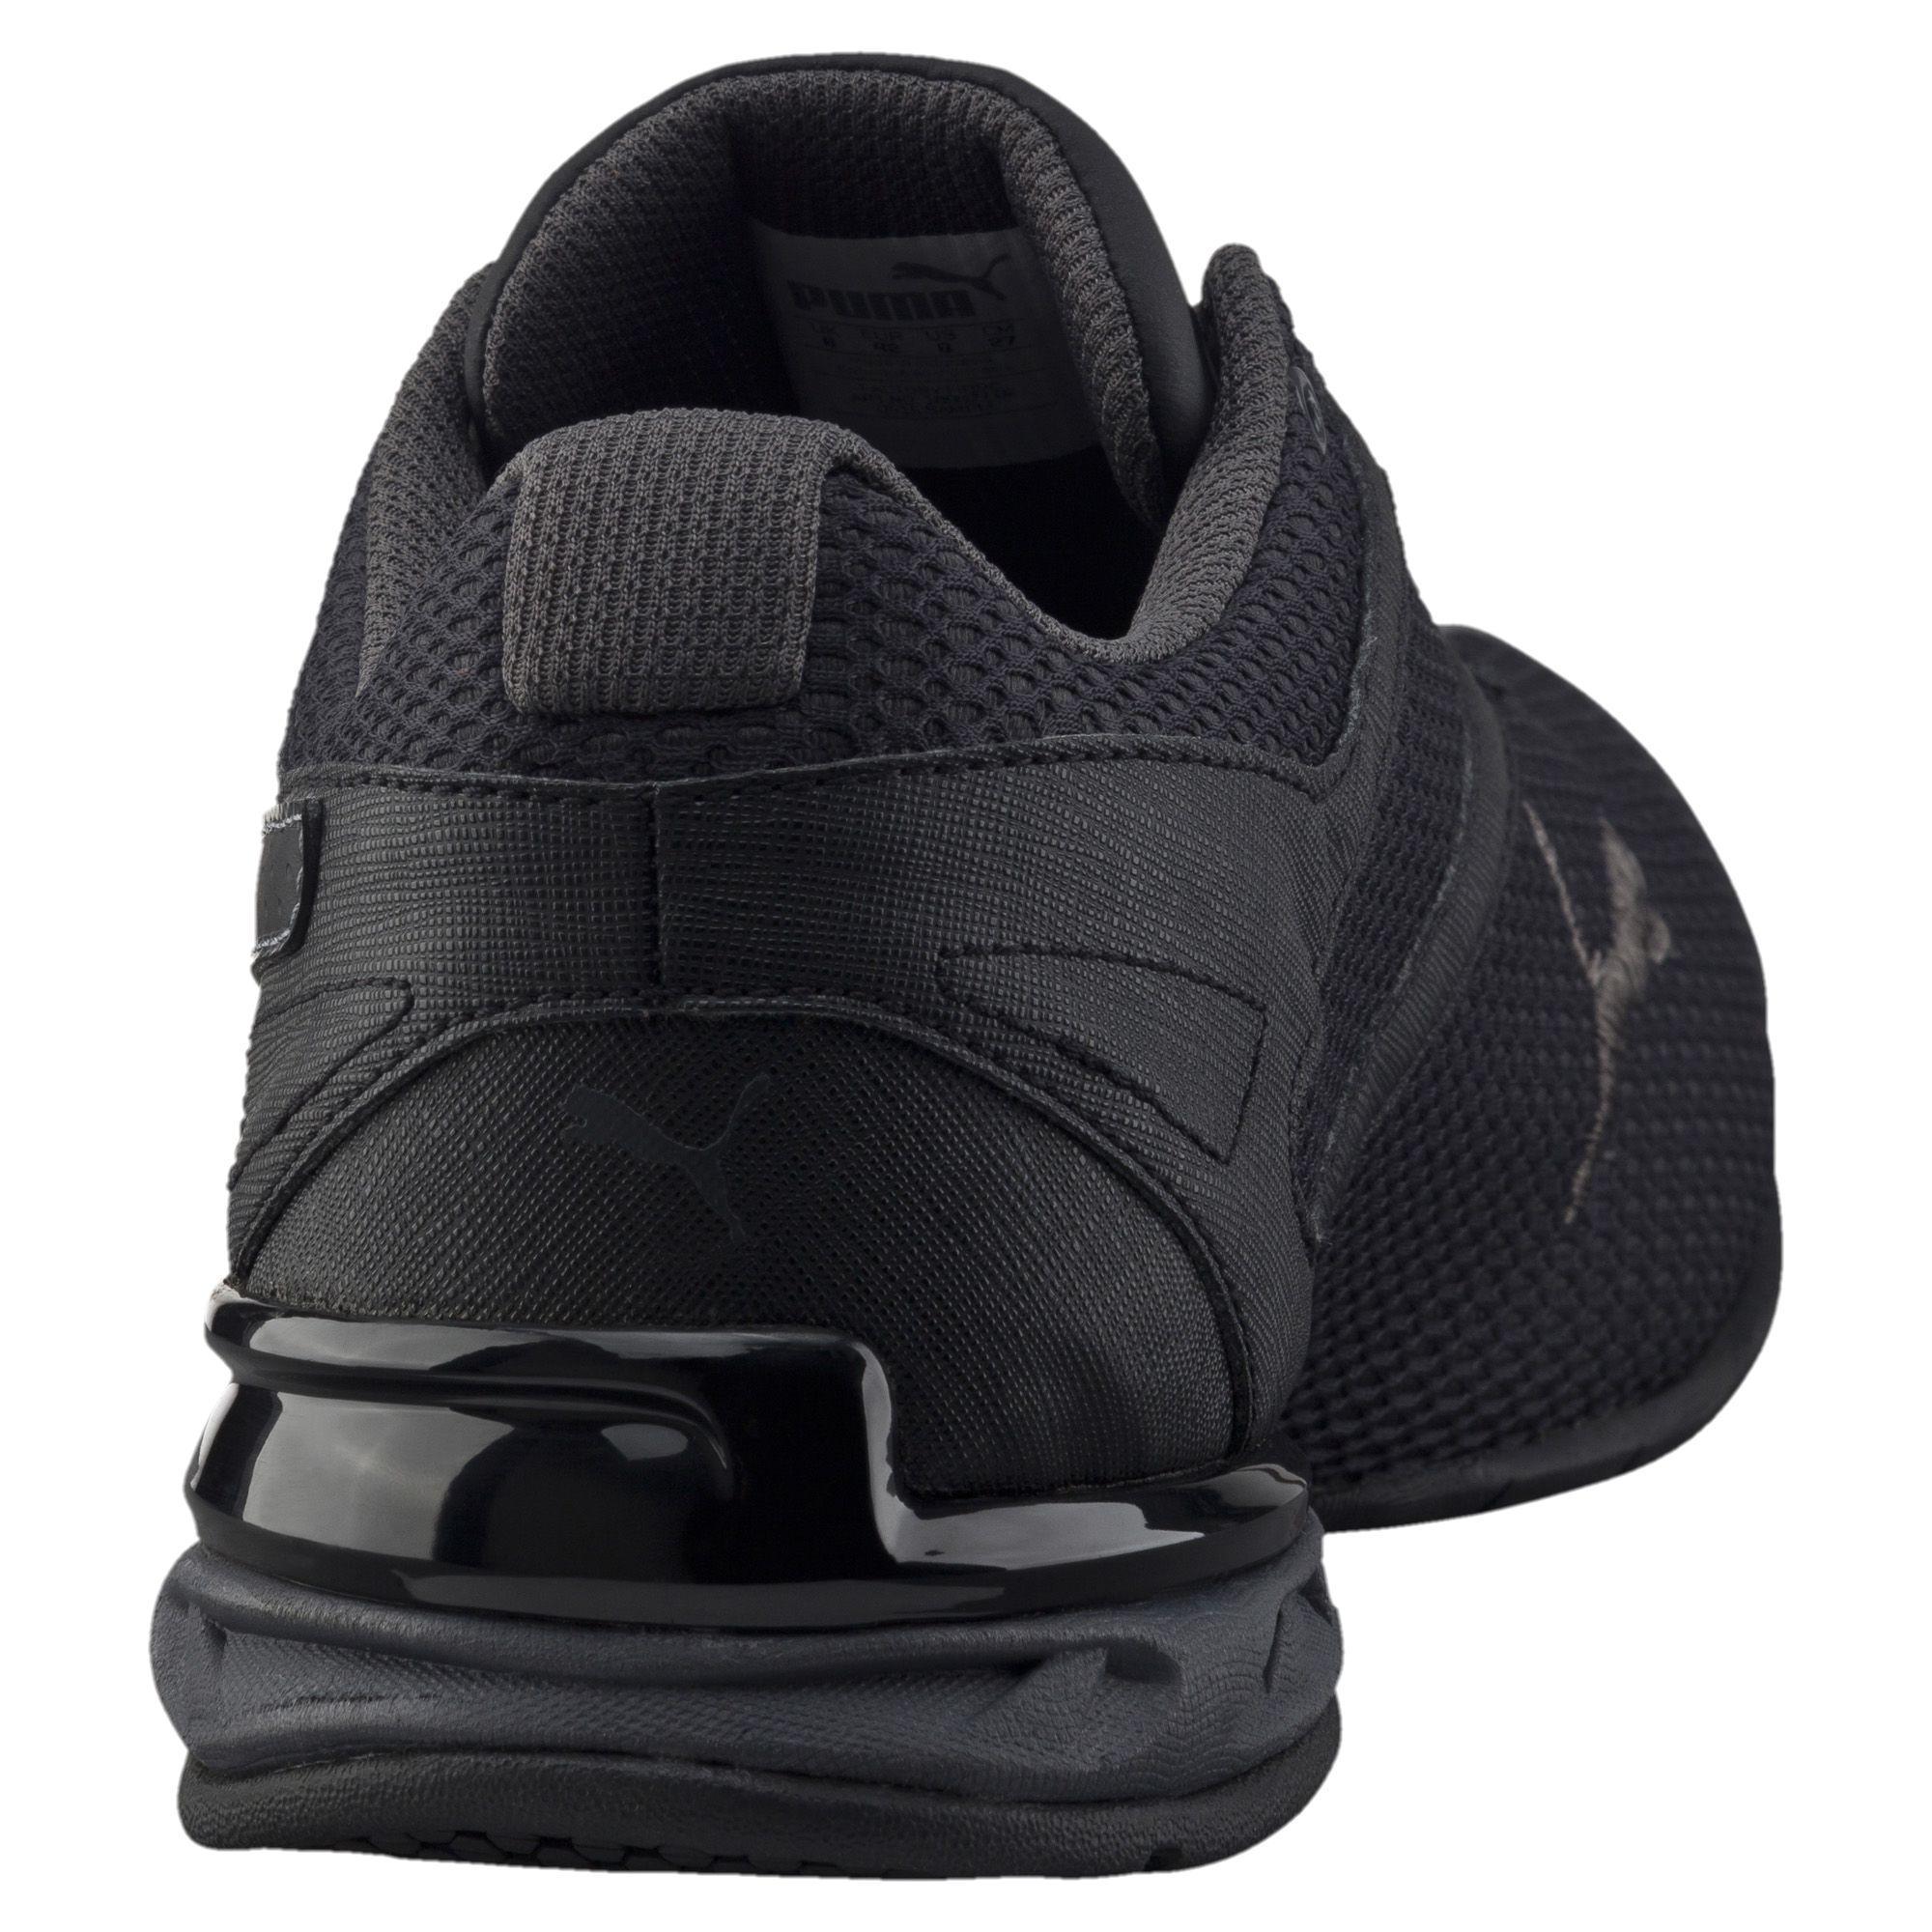 5fc269469cfad3 Lyst - PUMA Tazon 6 Mesh Men s Running Shoes in Black for Men